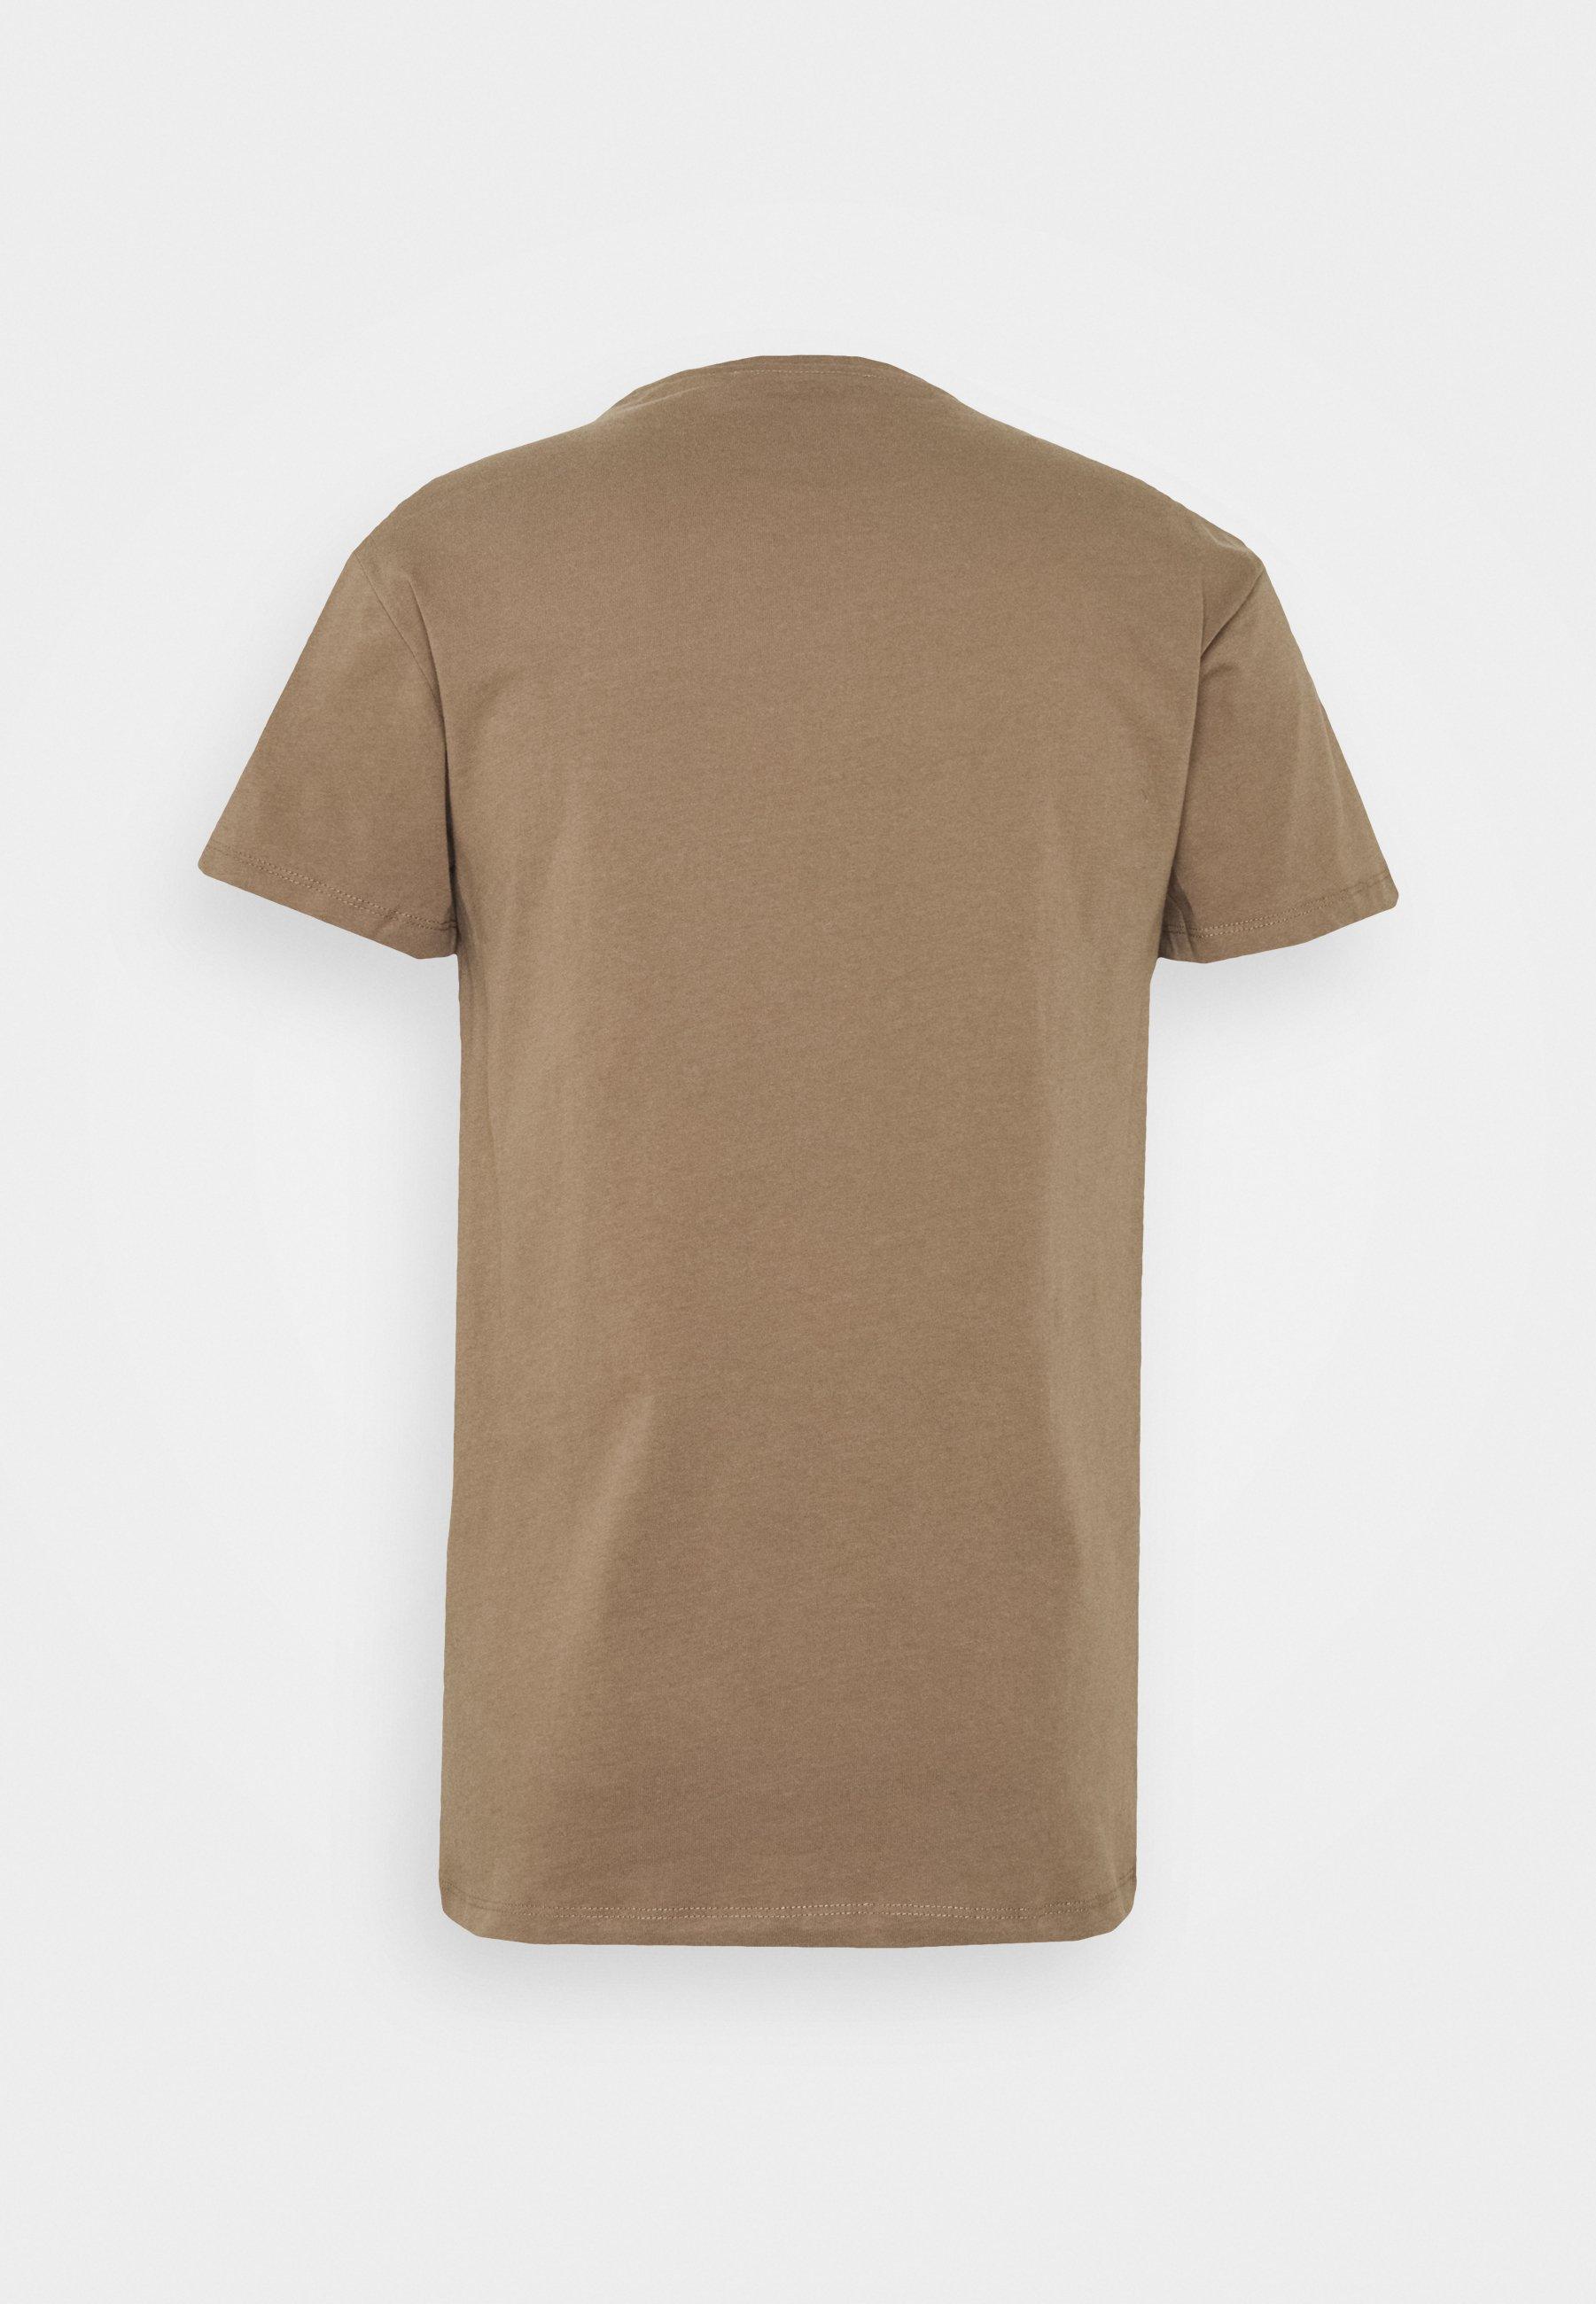 Samsøe Kronos - T-shirts Shitake/brun